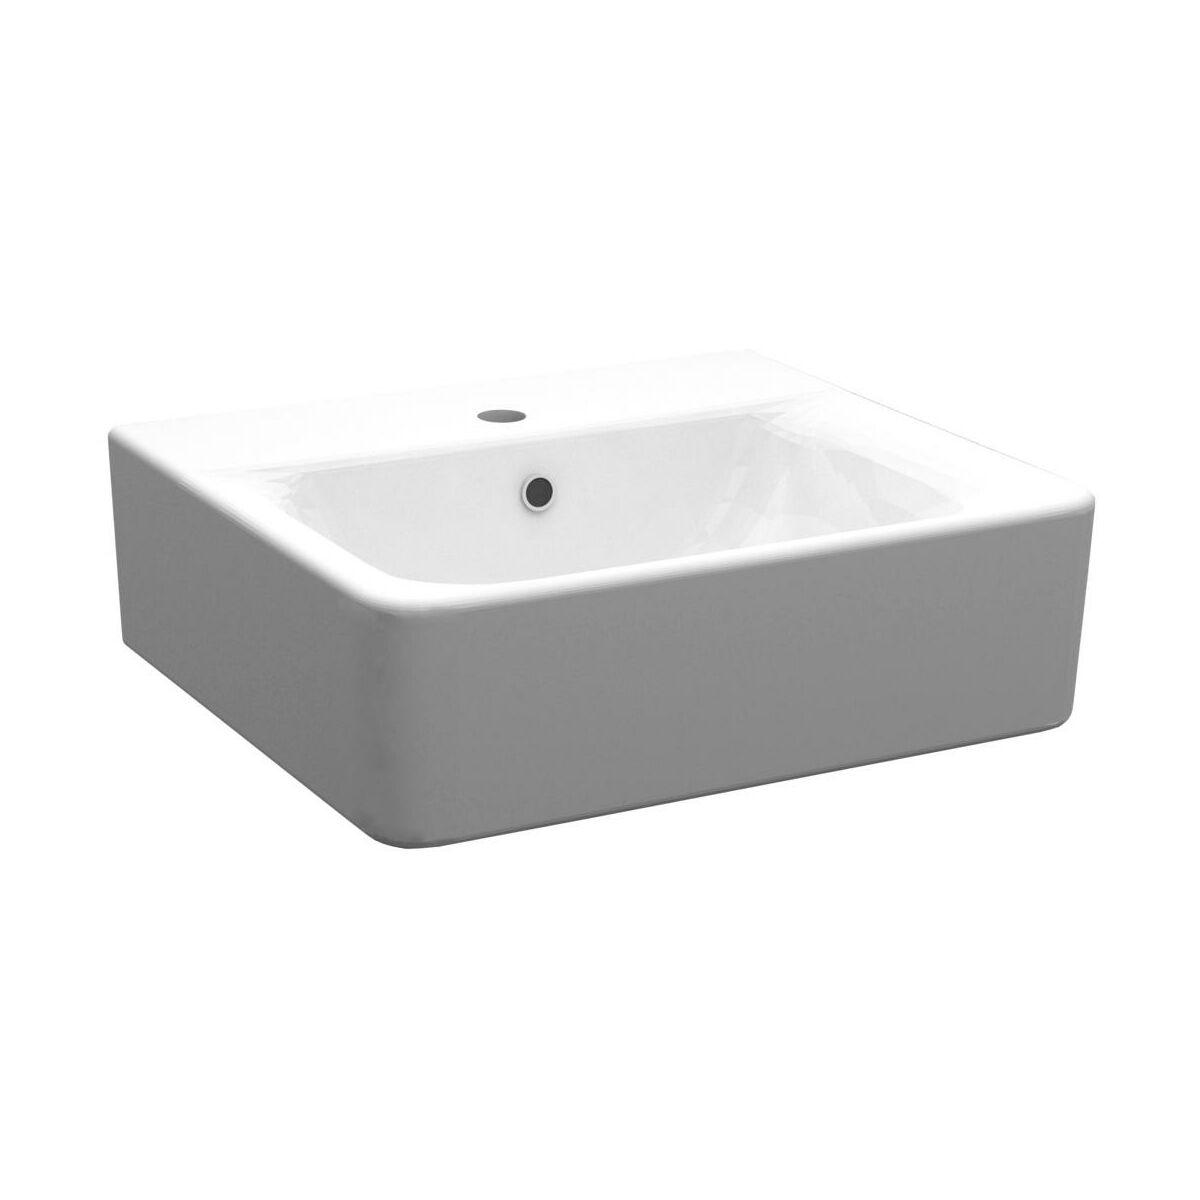 umywalka connect cube umywalki w atrakcyjnej cenie w sklepach leroy merlin. Black Bedroom Furniture Sets. Home Design Ideas